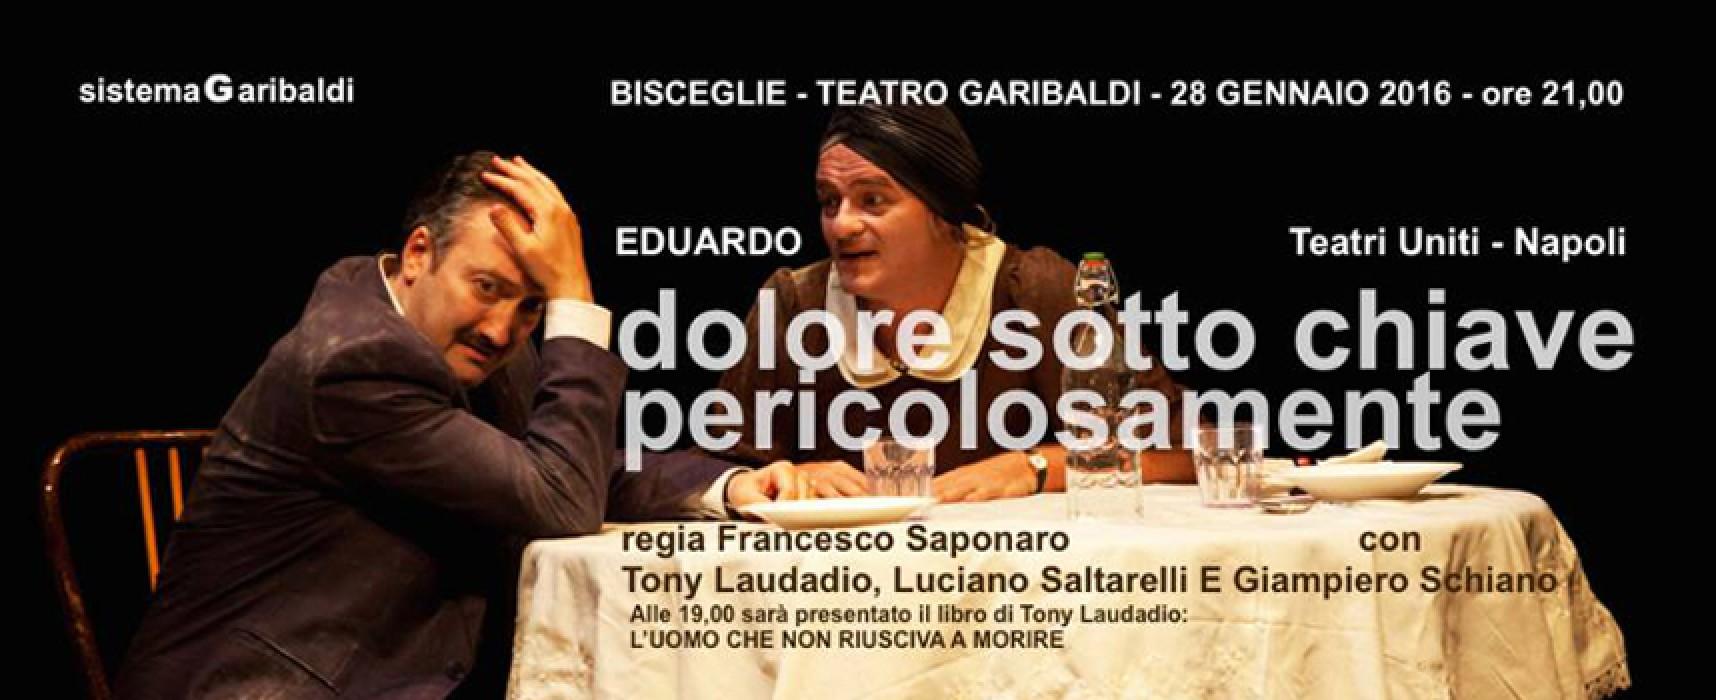 Il teatro di Eduardo al Garibaldi, giovedì due commedie con protagonista Tony Laudadio